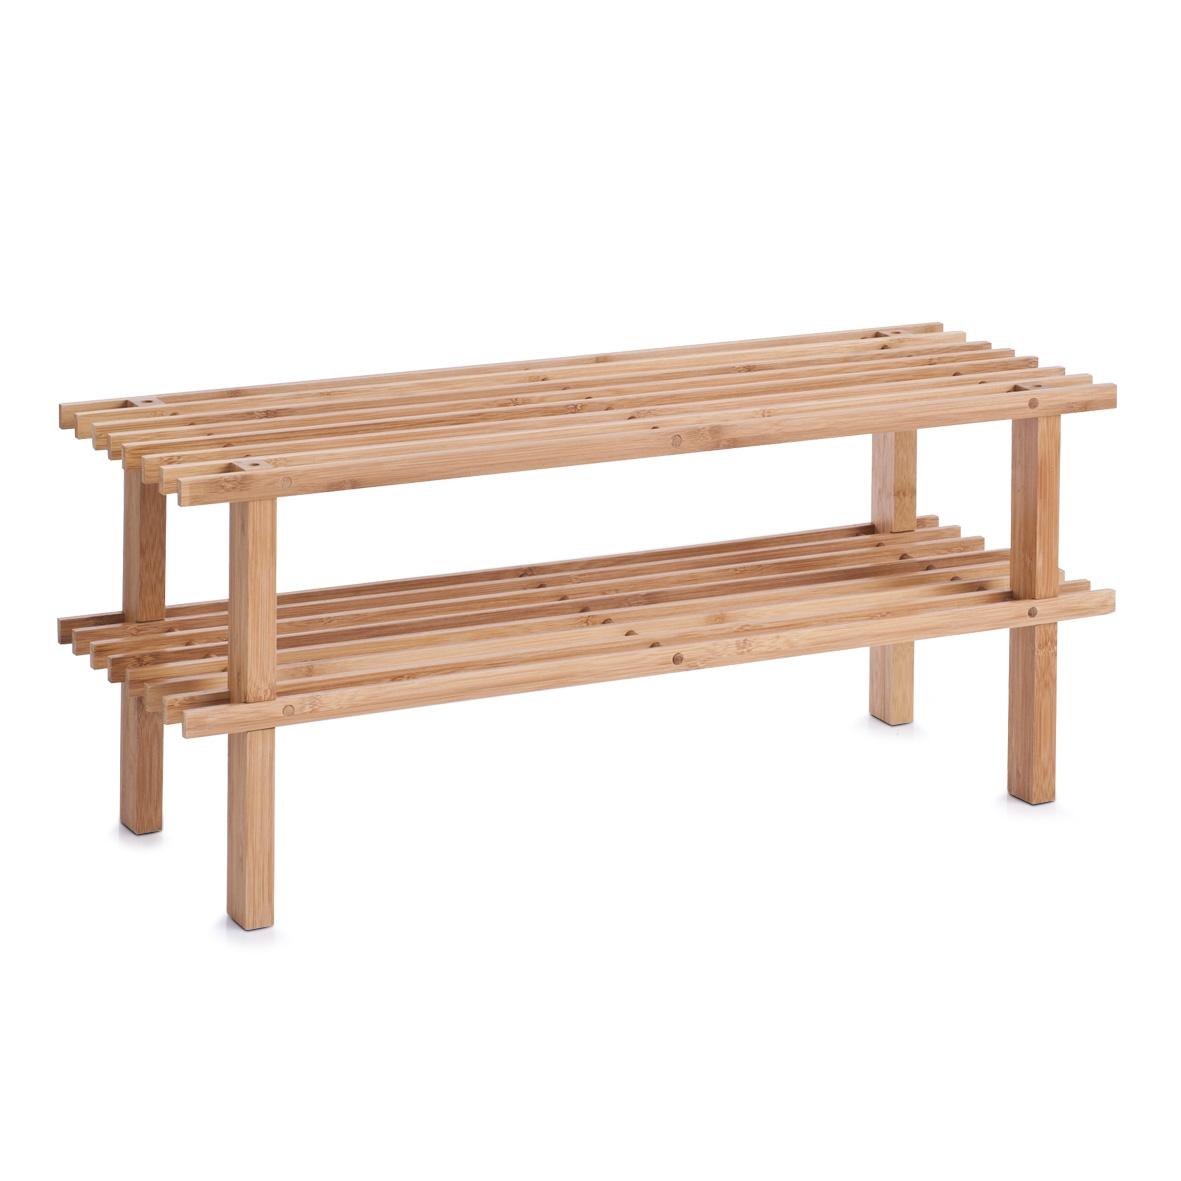 Suport pentru incaltaminte Stand Natural Bamboo l70xA26xH30 cm